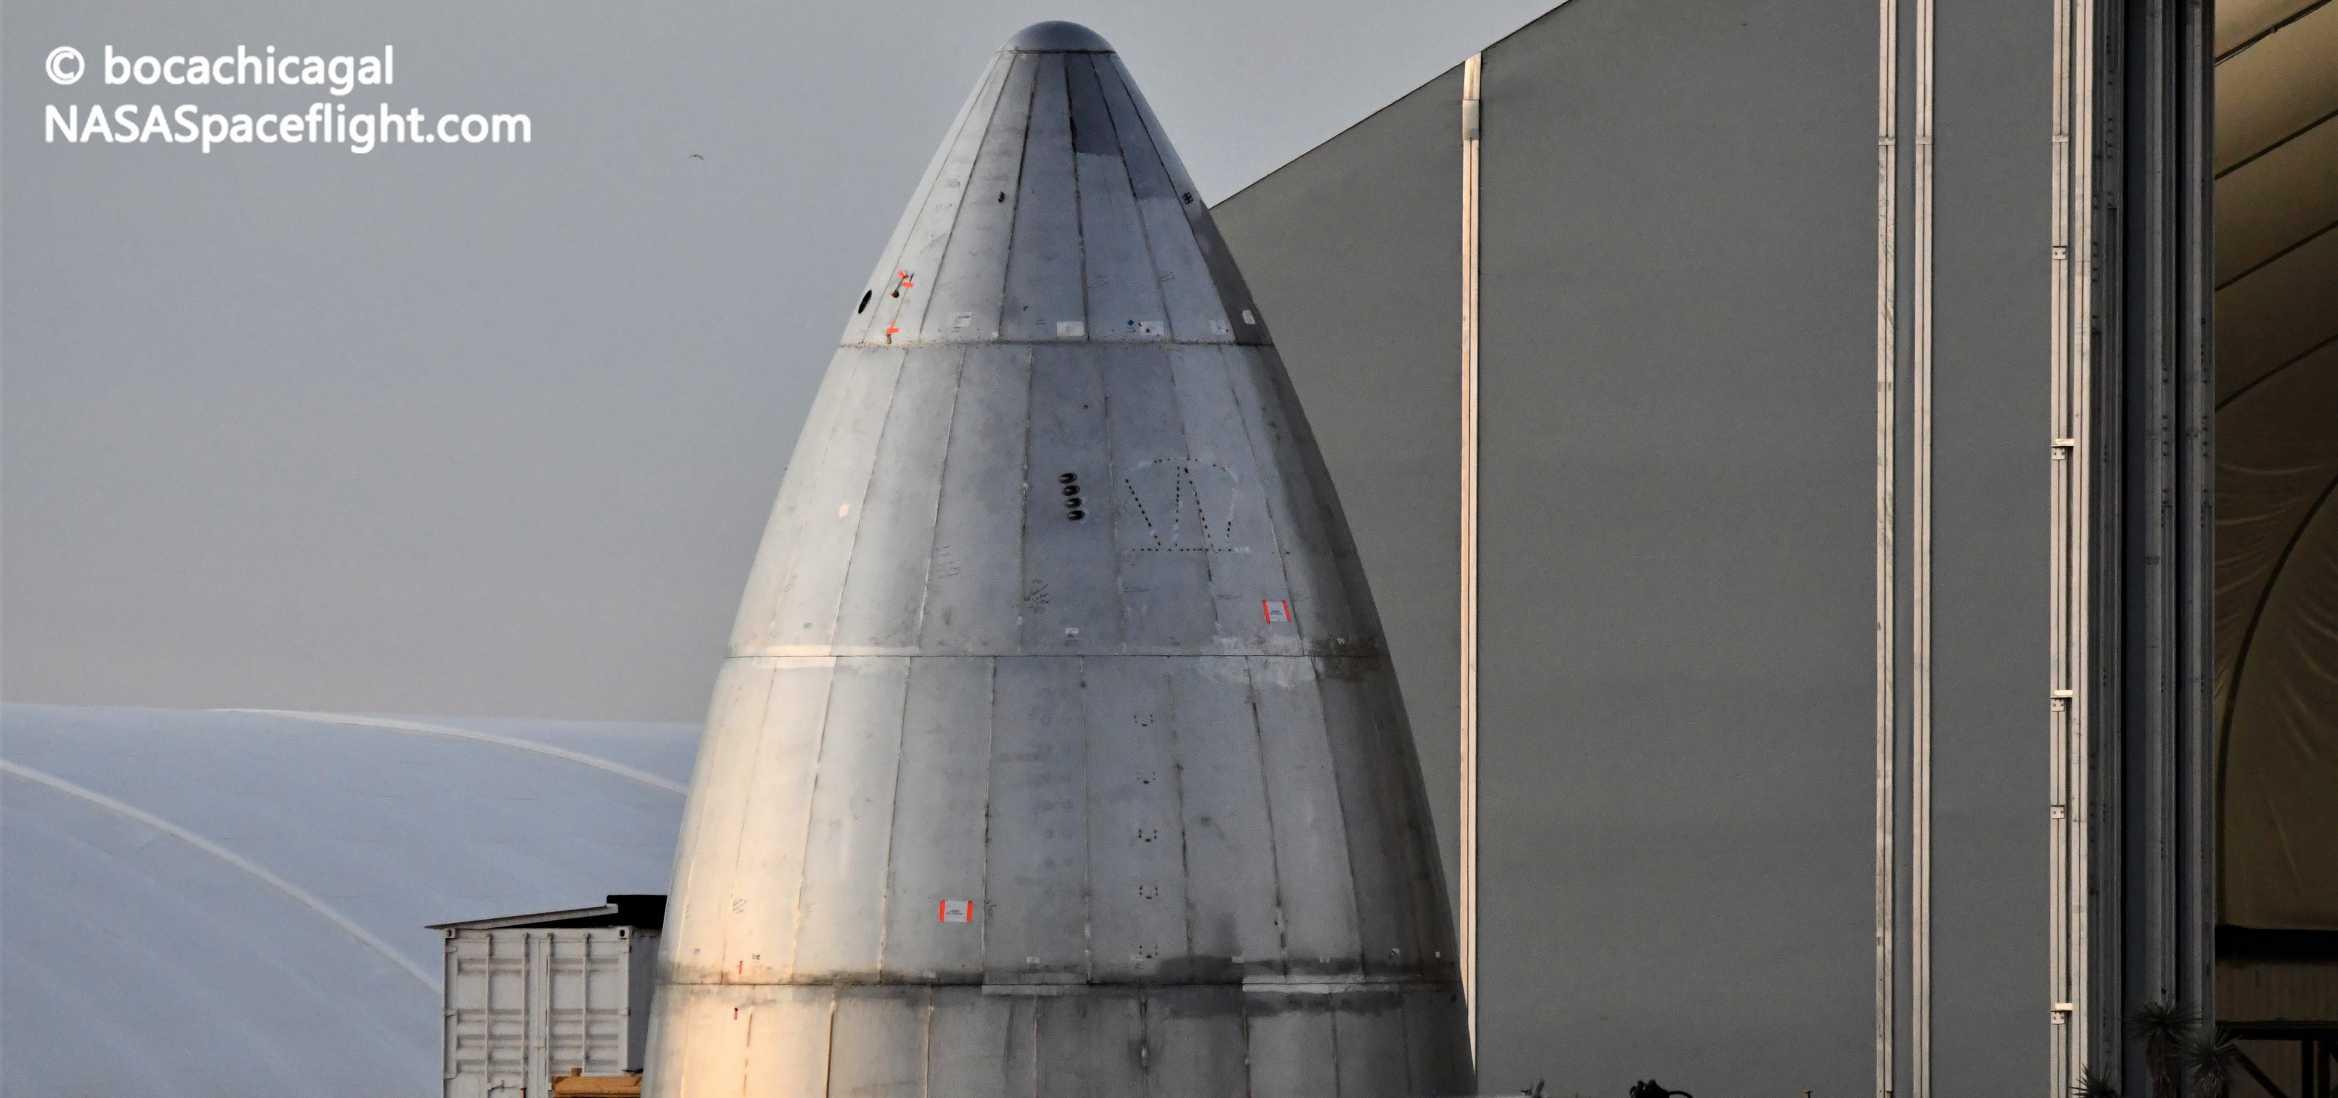 Starship Boca Chica 051720 (NASASpaceflight – bocachicagal) new nose 1 crop (c)